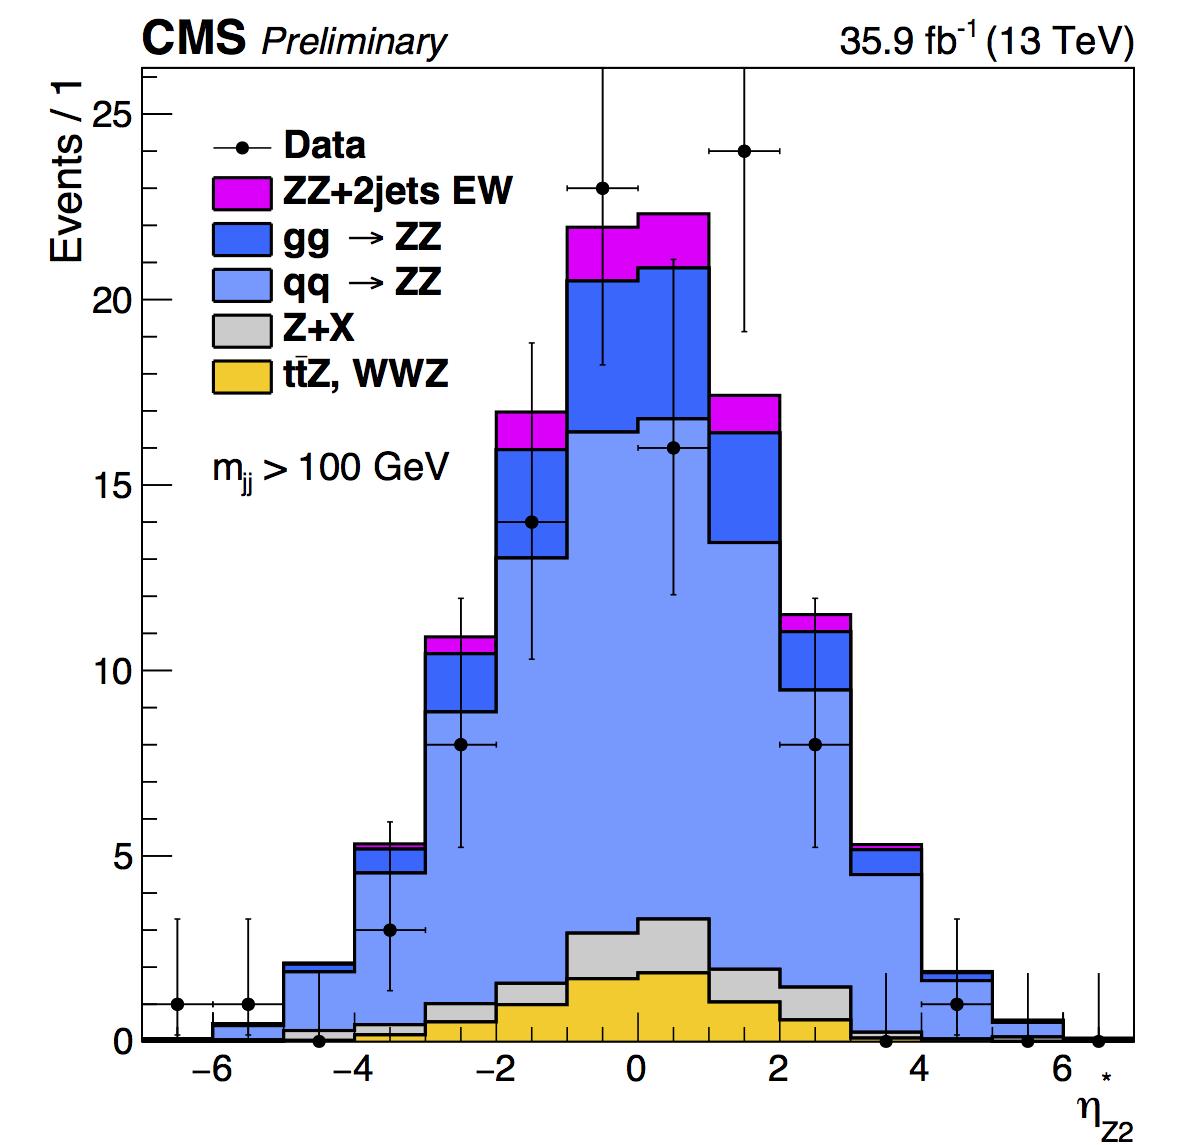 data_mc_BLS_Z2_zepp_all.pdf